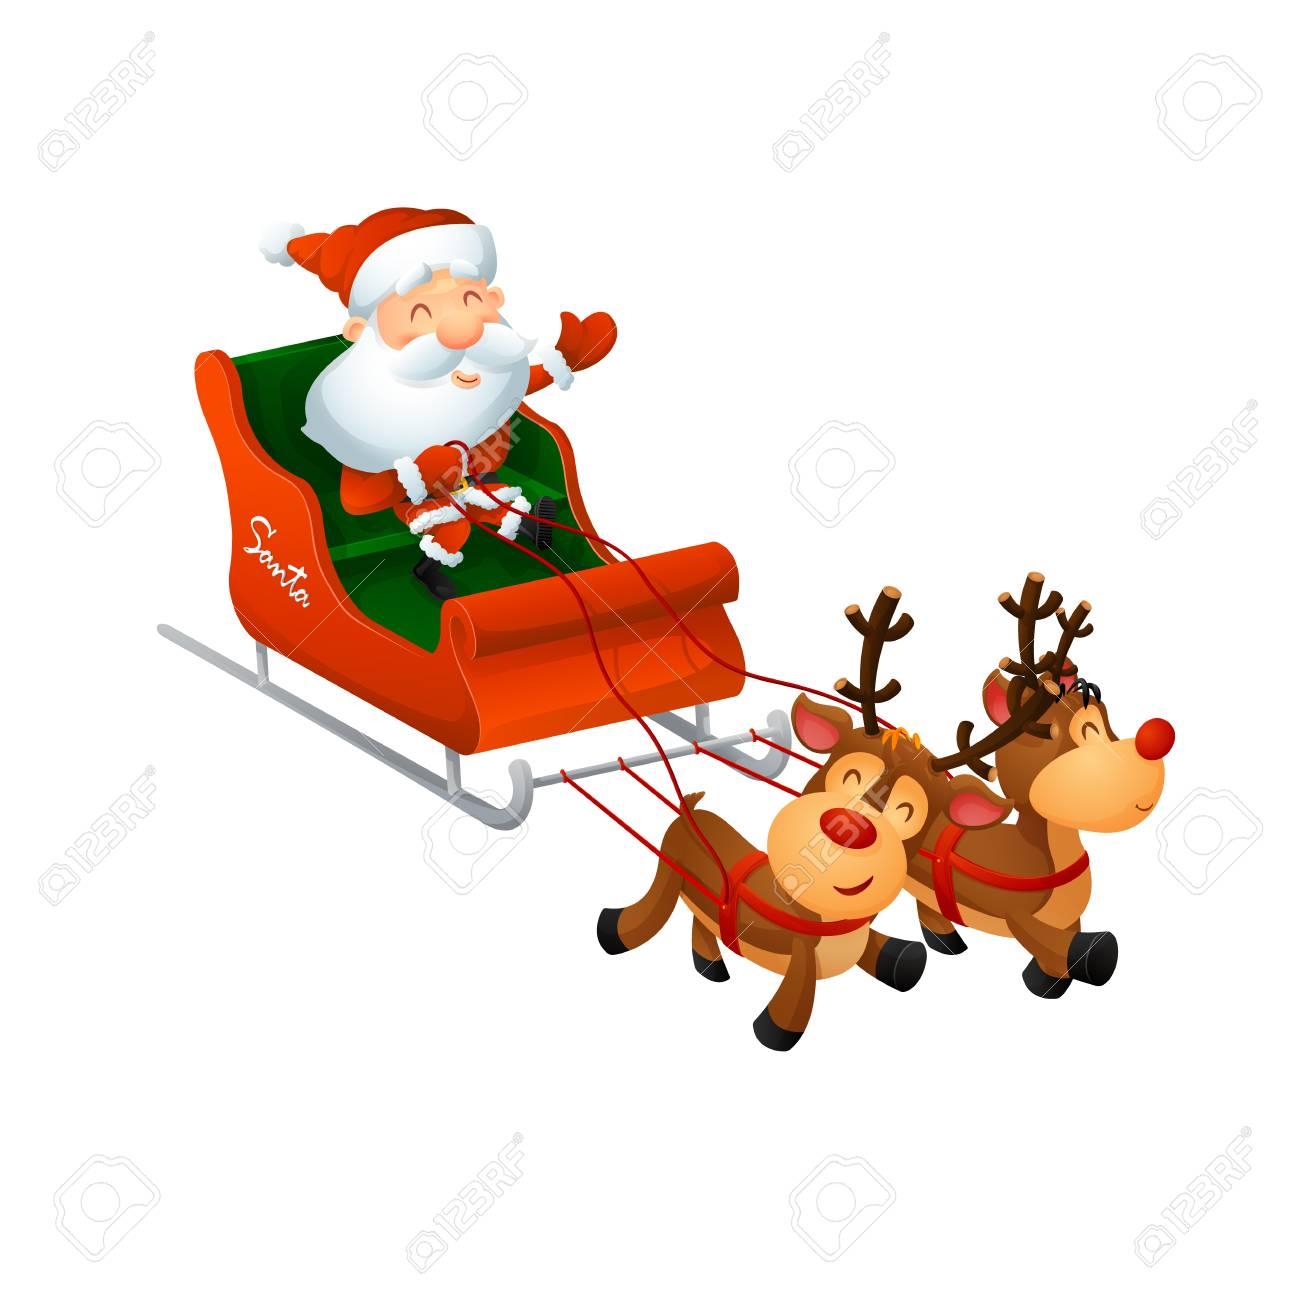 Cartoon cute Santa Claus on a sleigh with funny reindeer. On a white background, cartoon, vector illustration. - 112717772